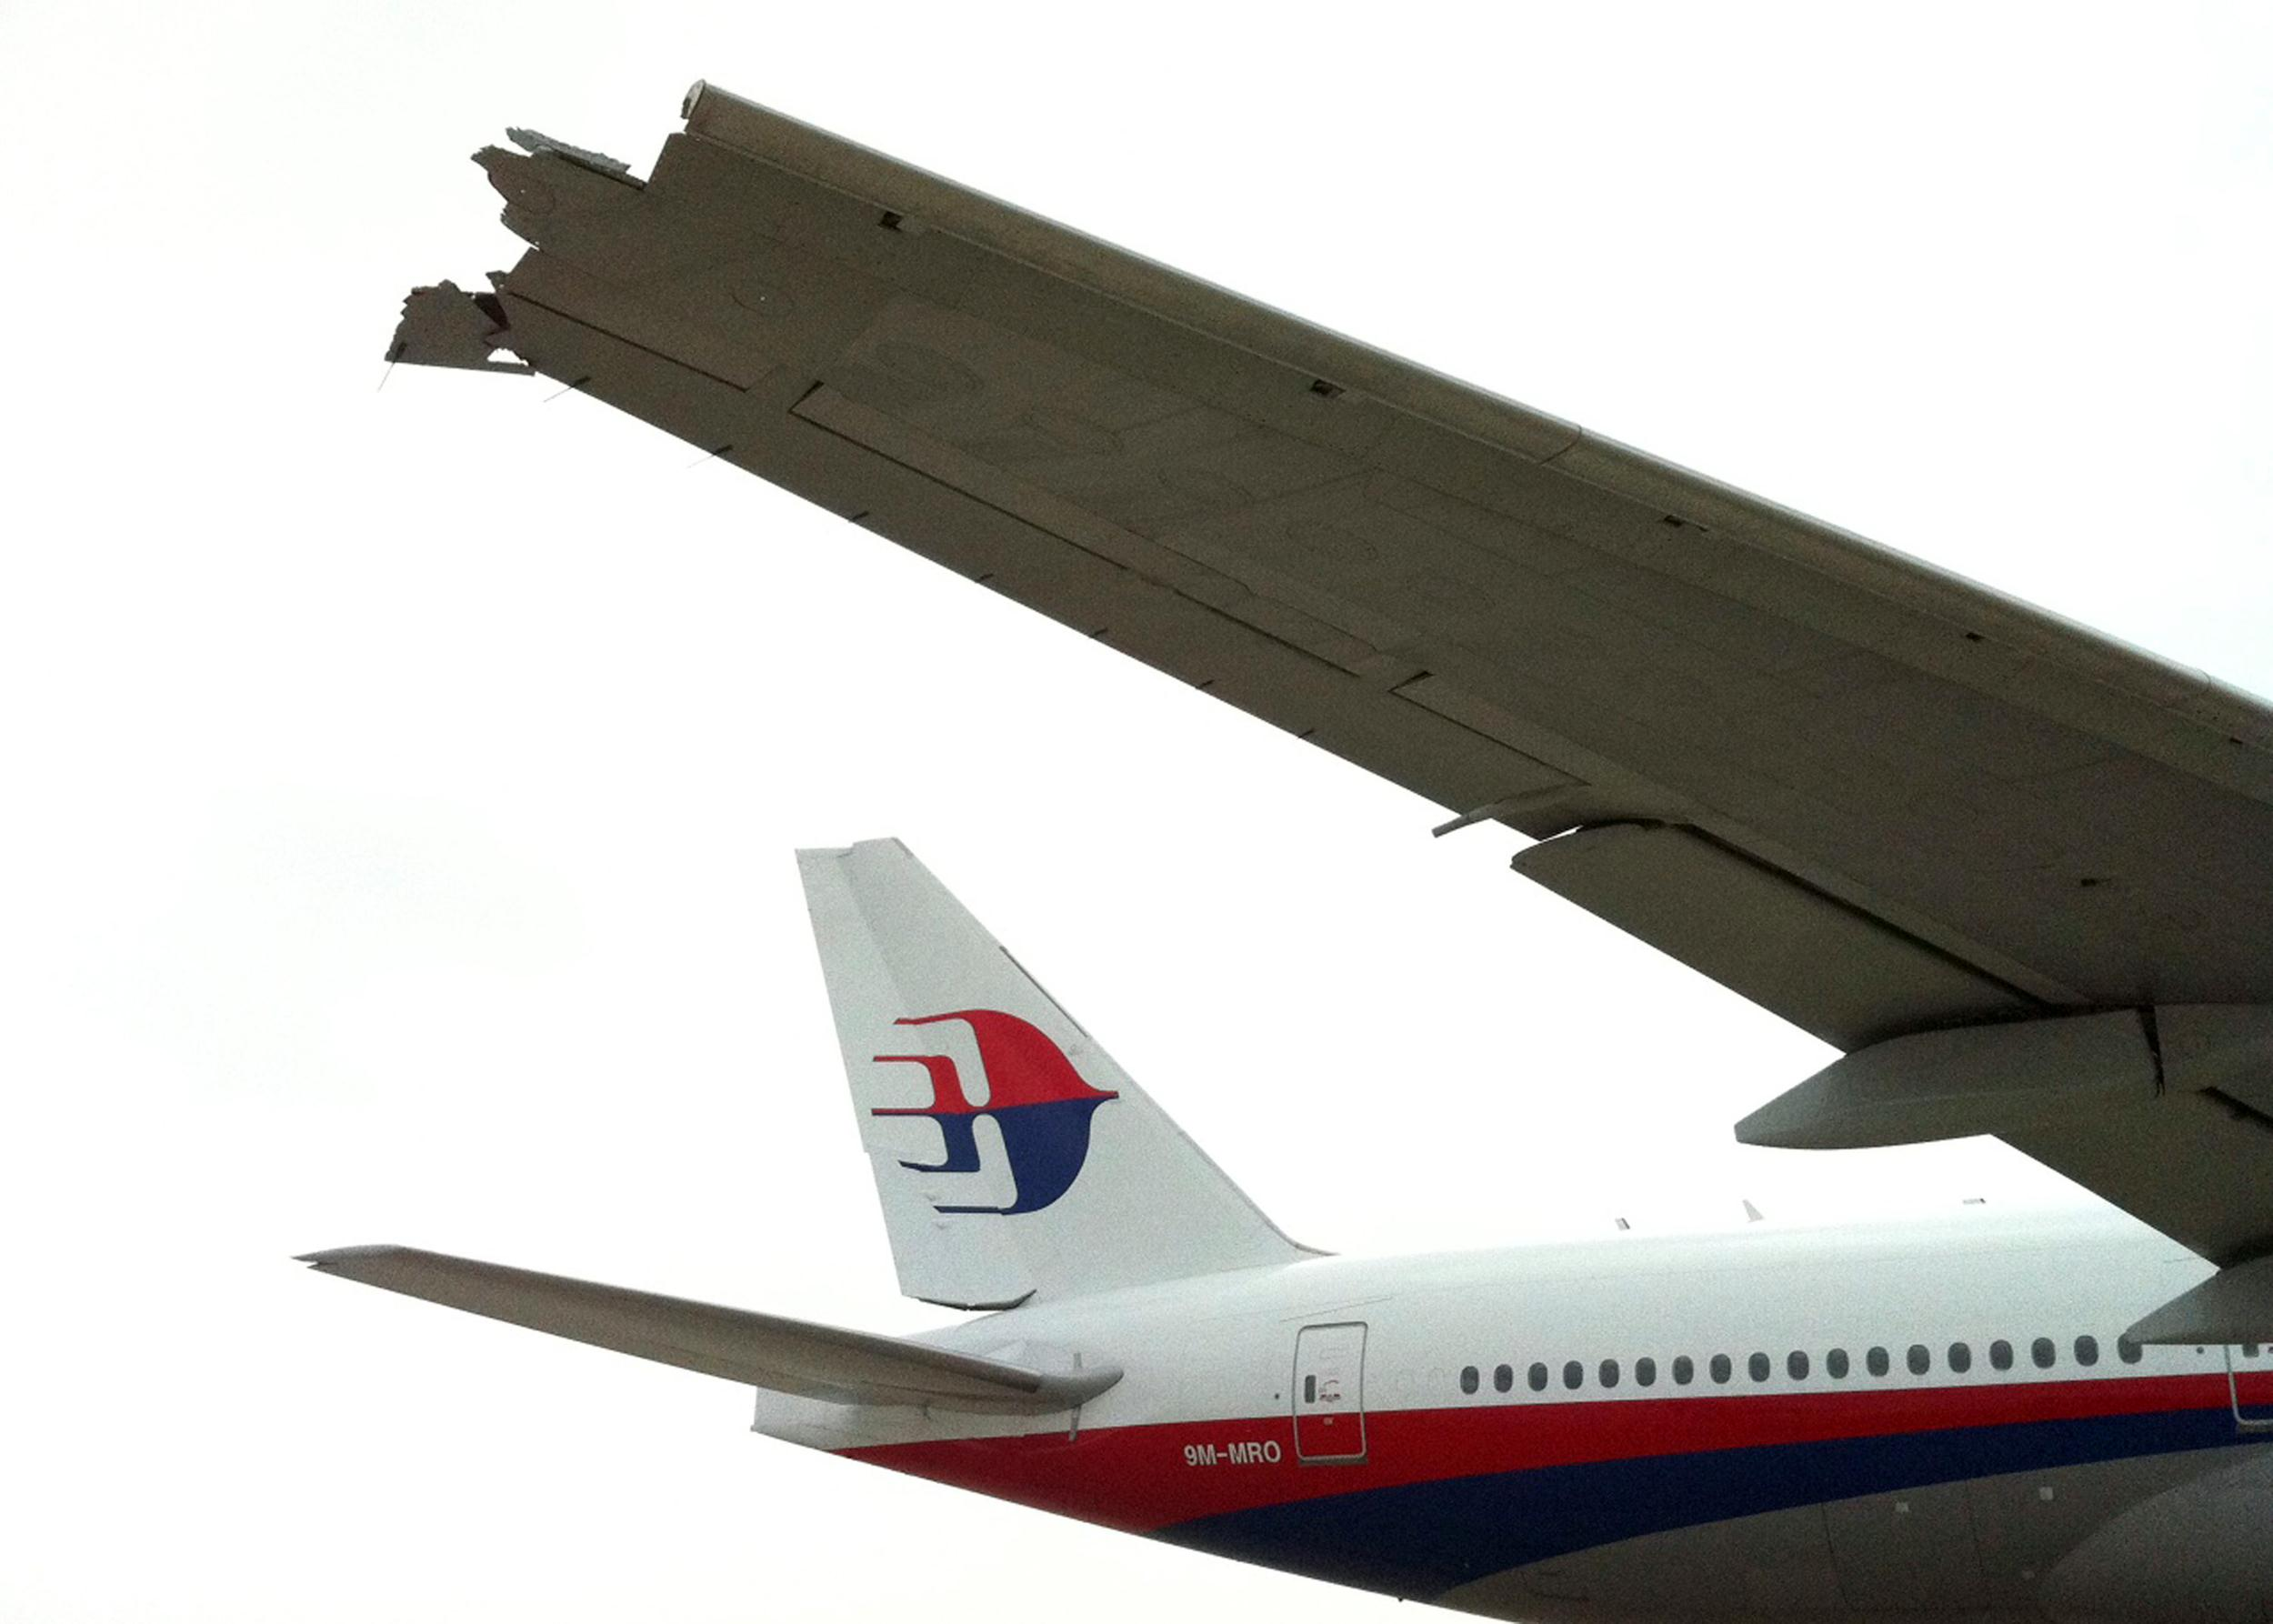 Malaysia Airlines Boeing 777-200ER Vol MH-370 immatriculé 9M-MRO porté disparu 140308-malaysian-jet-collision-0912_8785483b83a985db9ae72716530f46ff